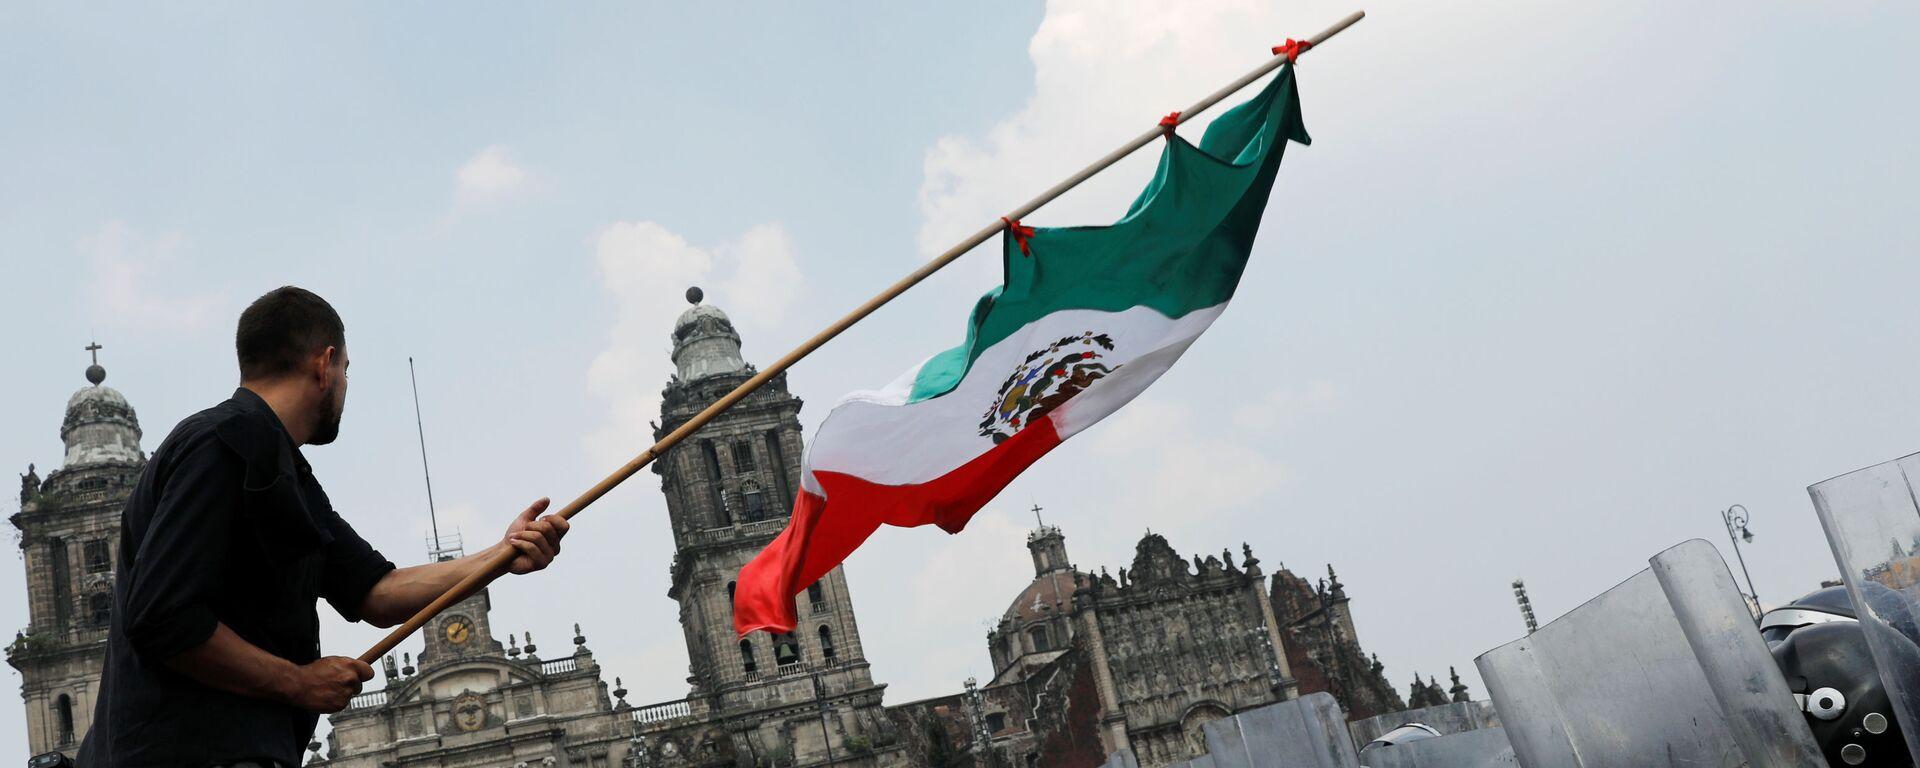 Protesta contra el presidente de México, Andrés Manuel López Obrador - Sputnik Mundo, 1920, 13.10.2020